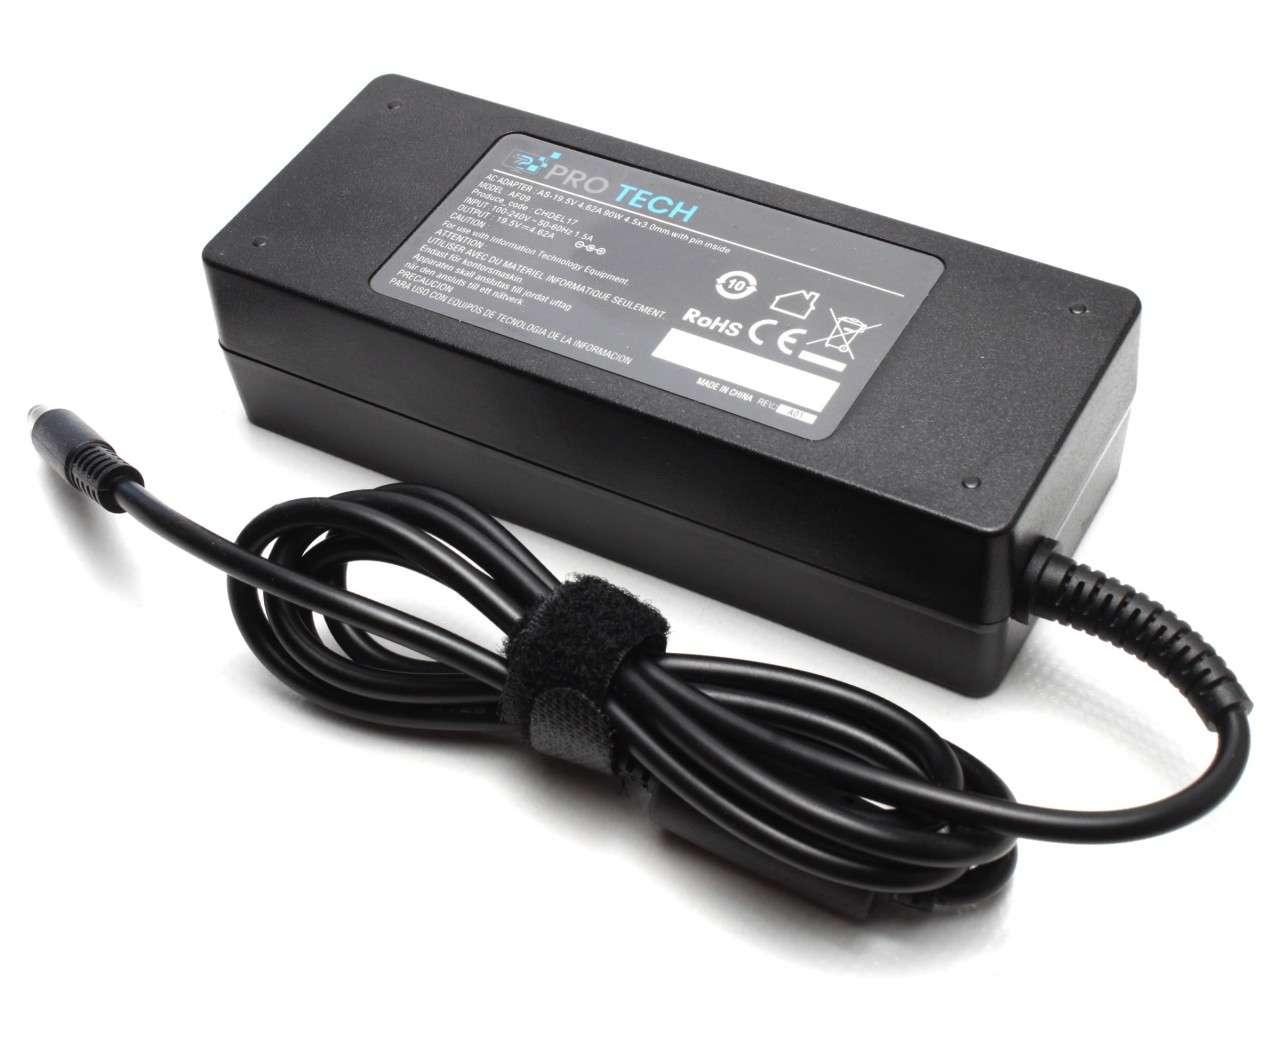 Incarcator Dell Inspiron 17 5755 90W Replacement imagine powerlaptop.ro 2021